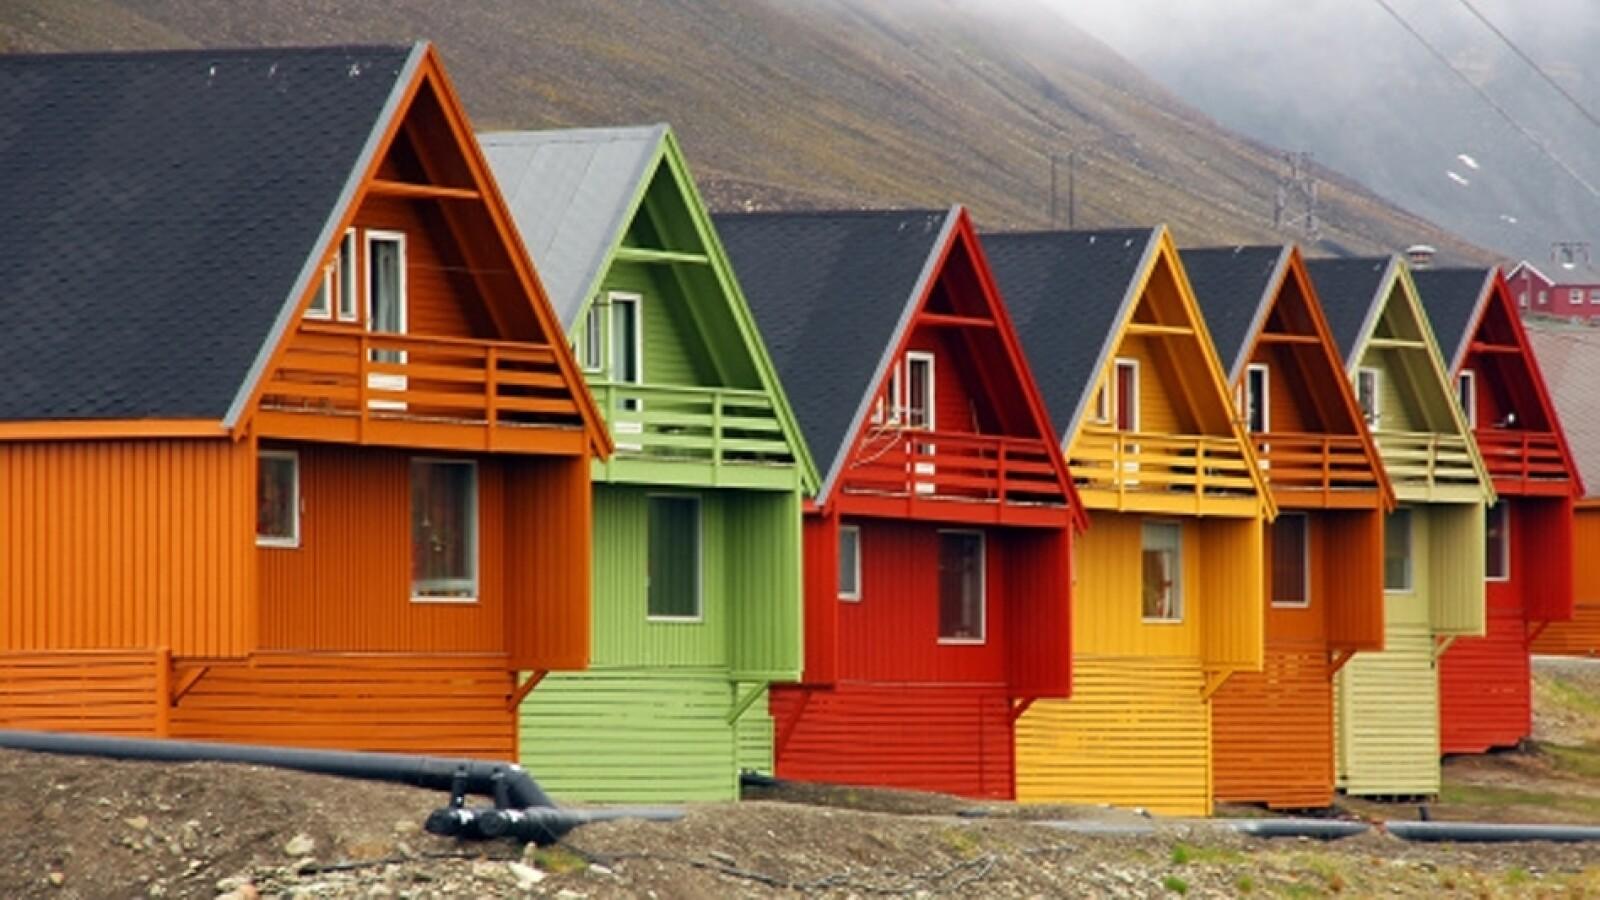 Svalbard archipiélago noruego Groenlandia